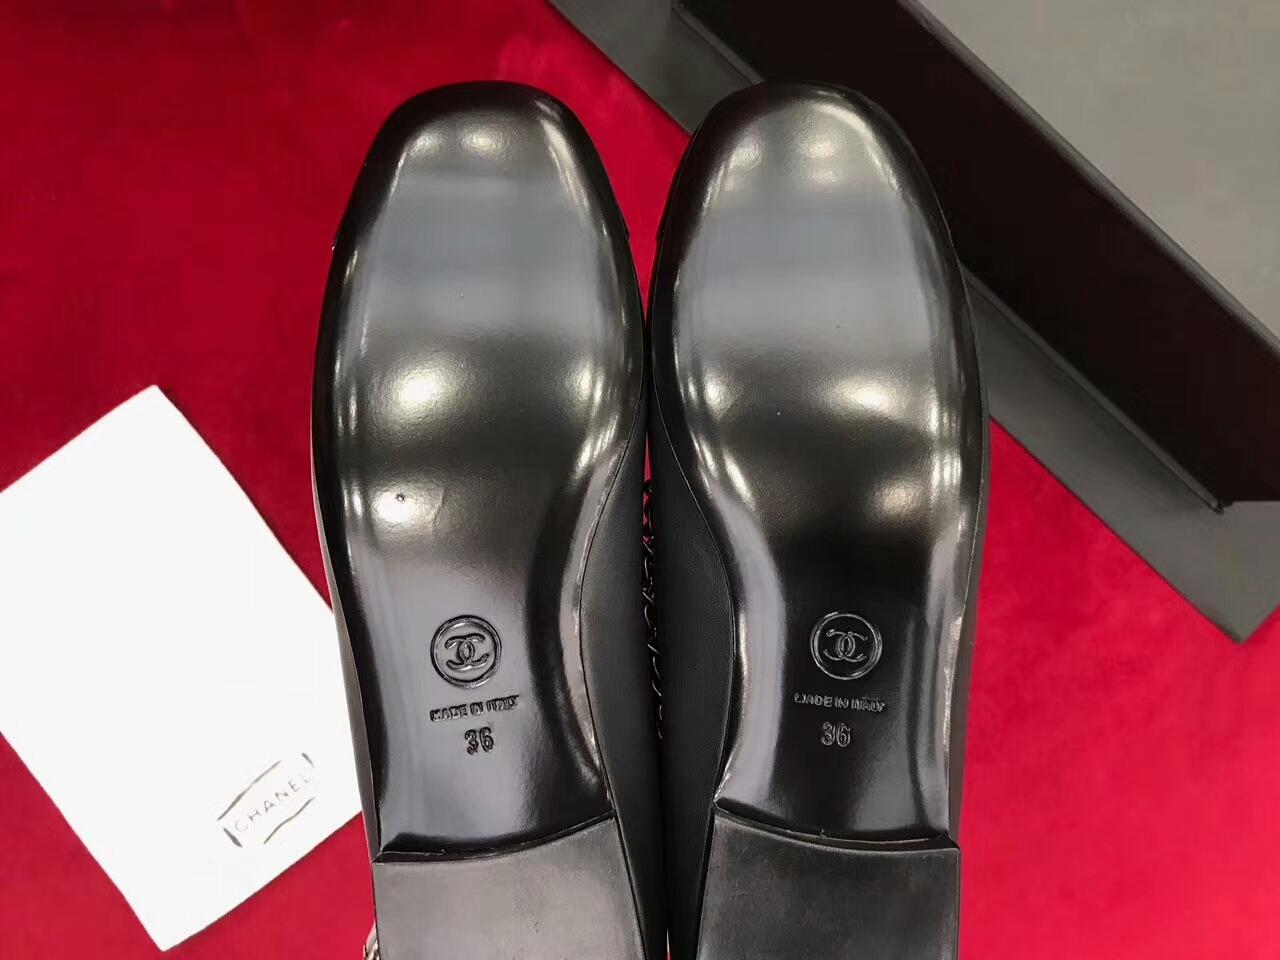 Chanel平底单鞋 17AW顶级链条系列单鞋 顶级货版本!